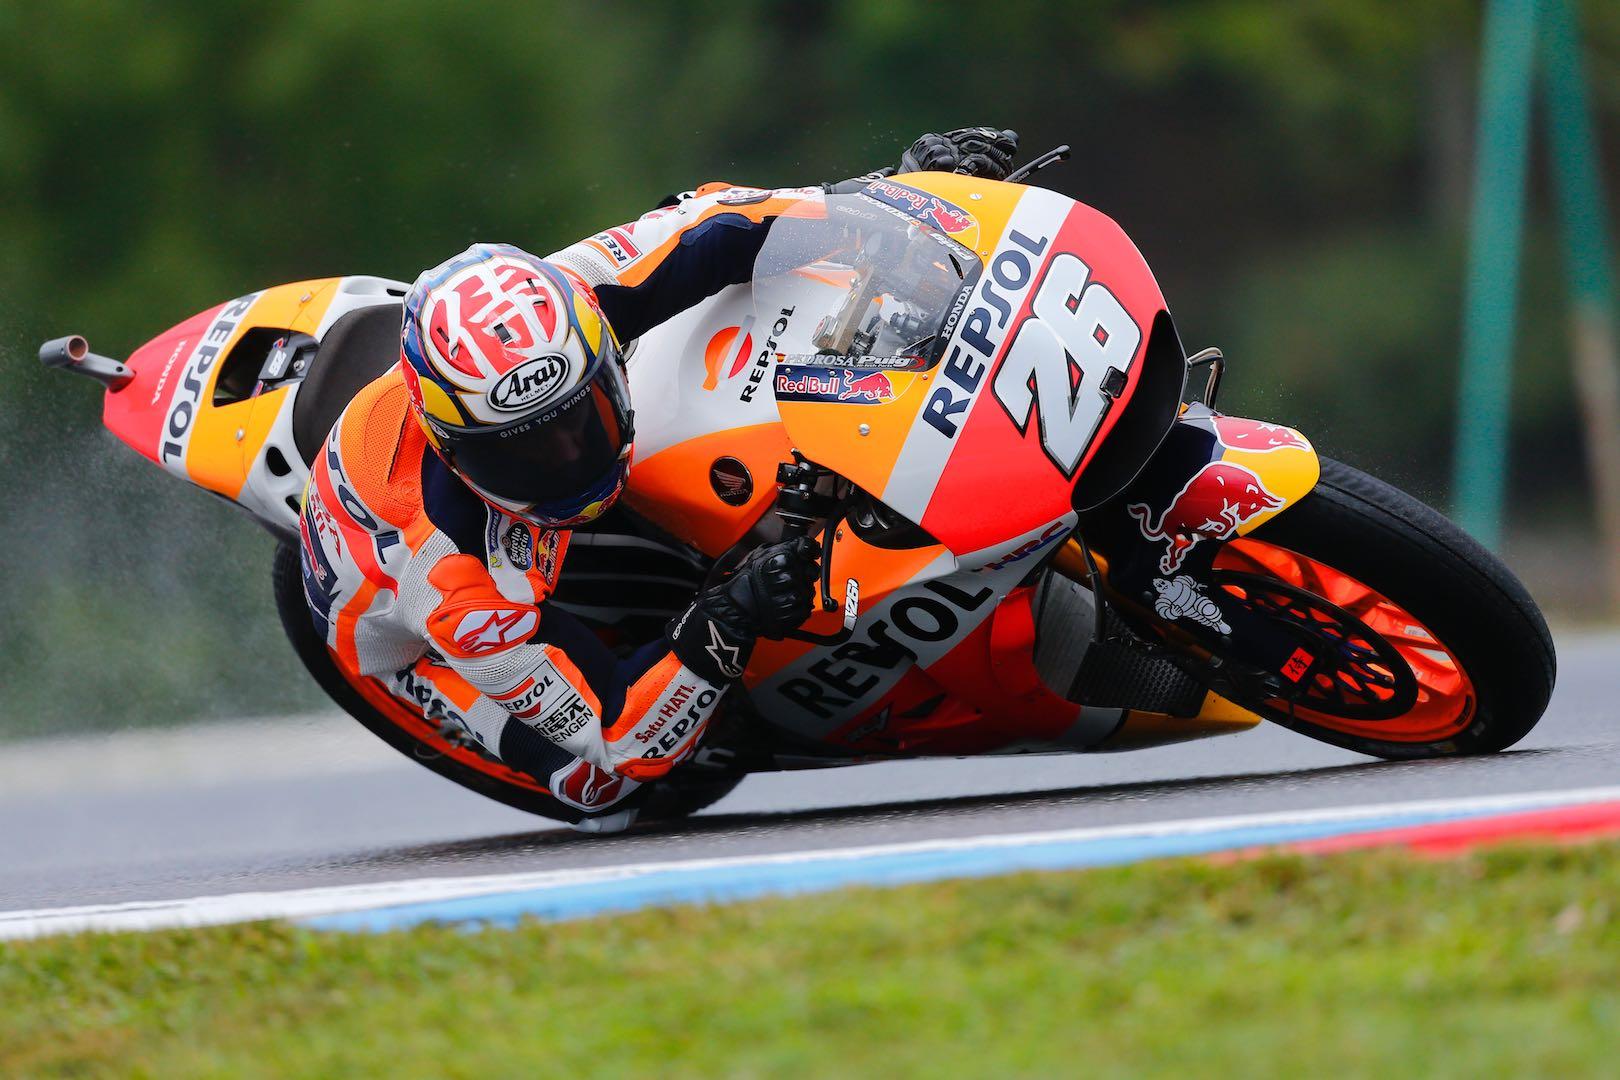 MOTOGP motorbike motorcycle bike race racing gran prix superbike wallpaper | 1620x1080 | 1202282 ...